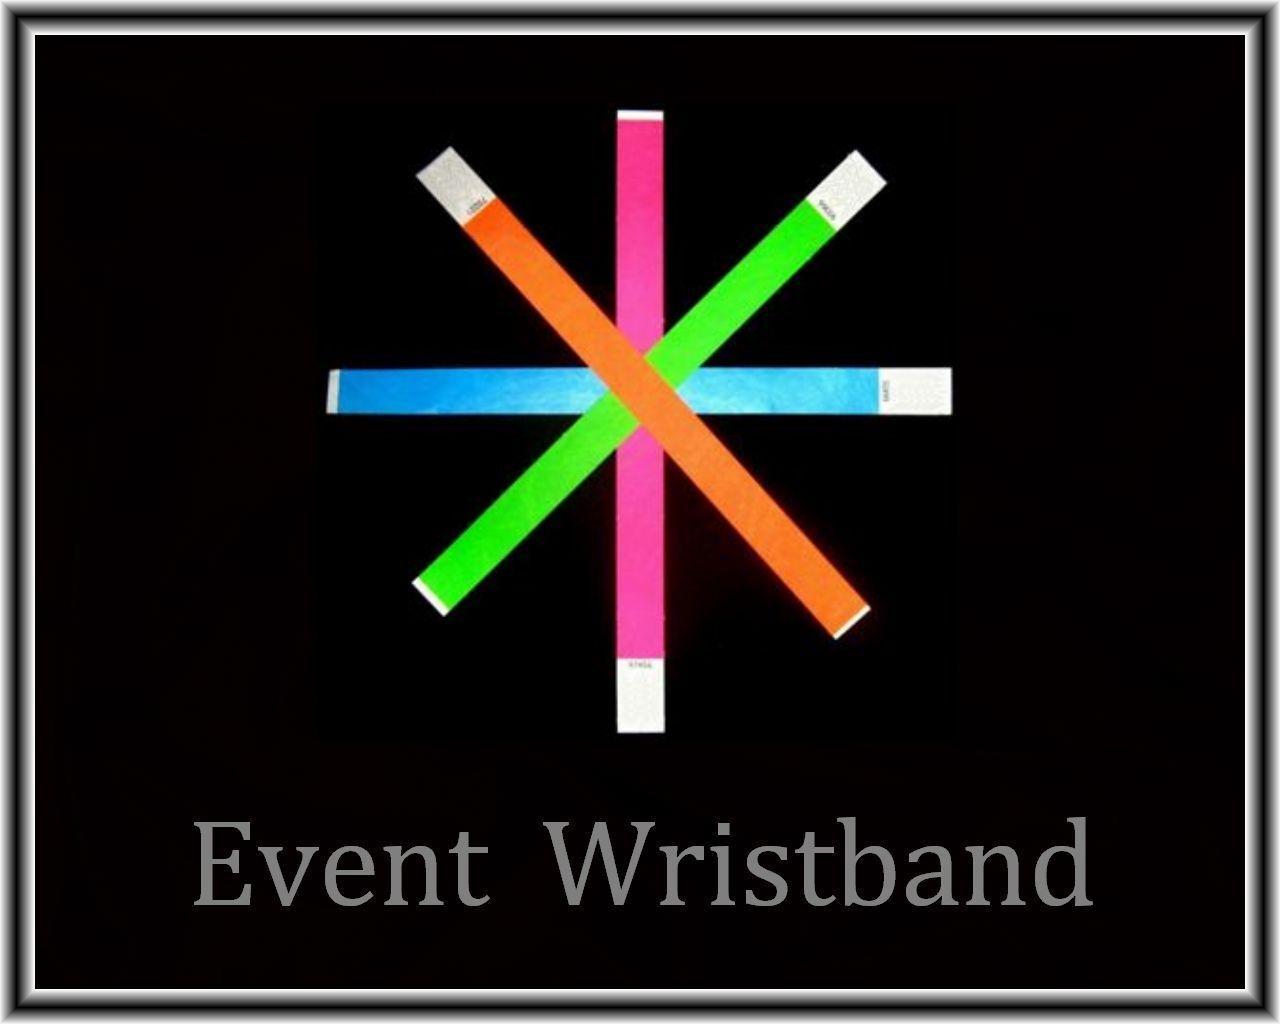 Event Wristband Company